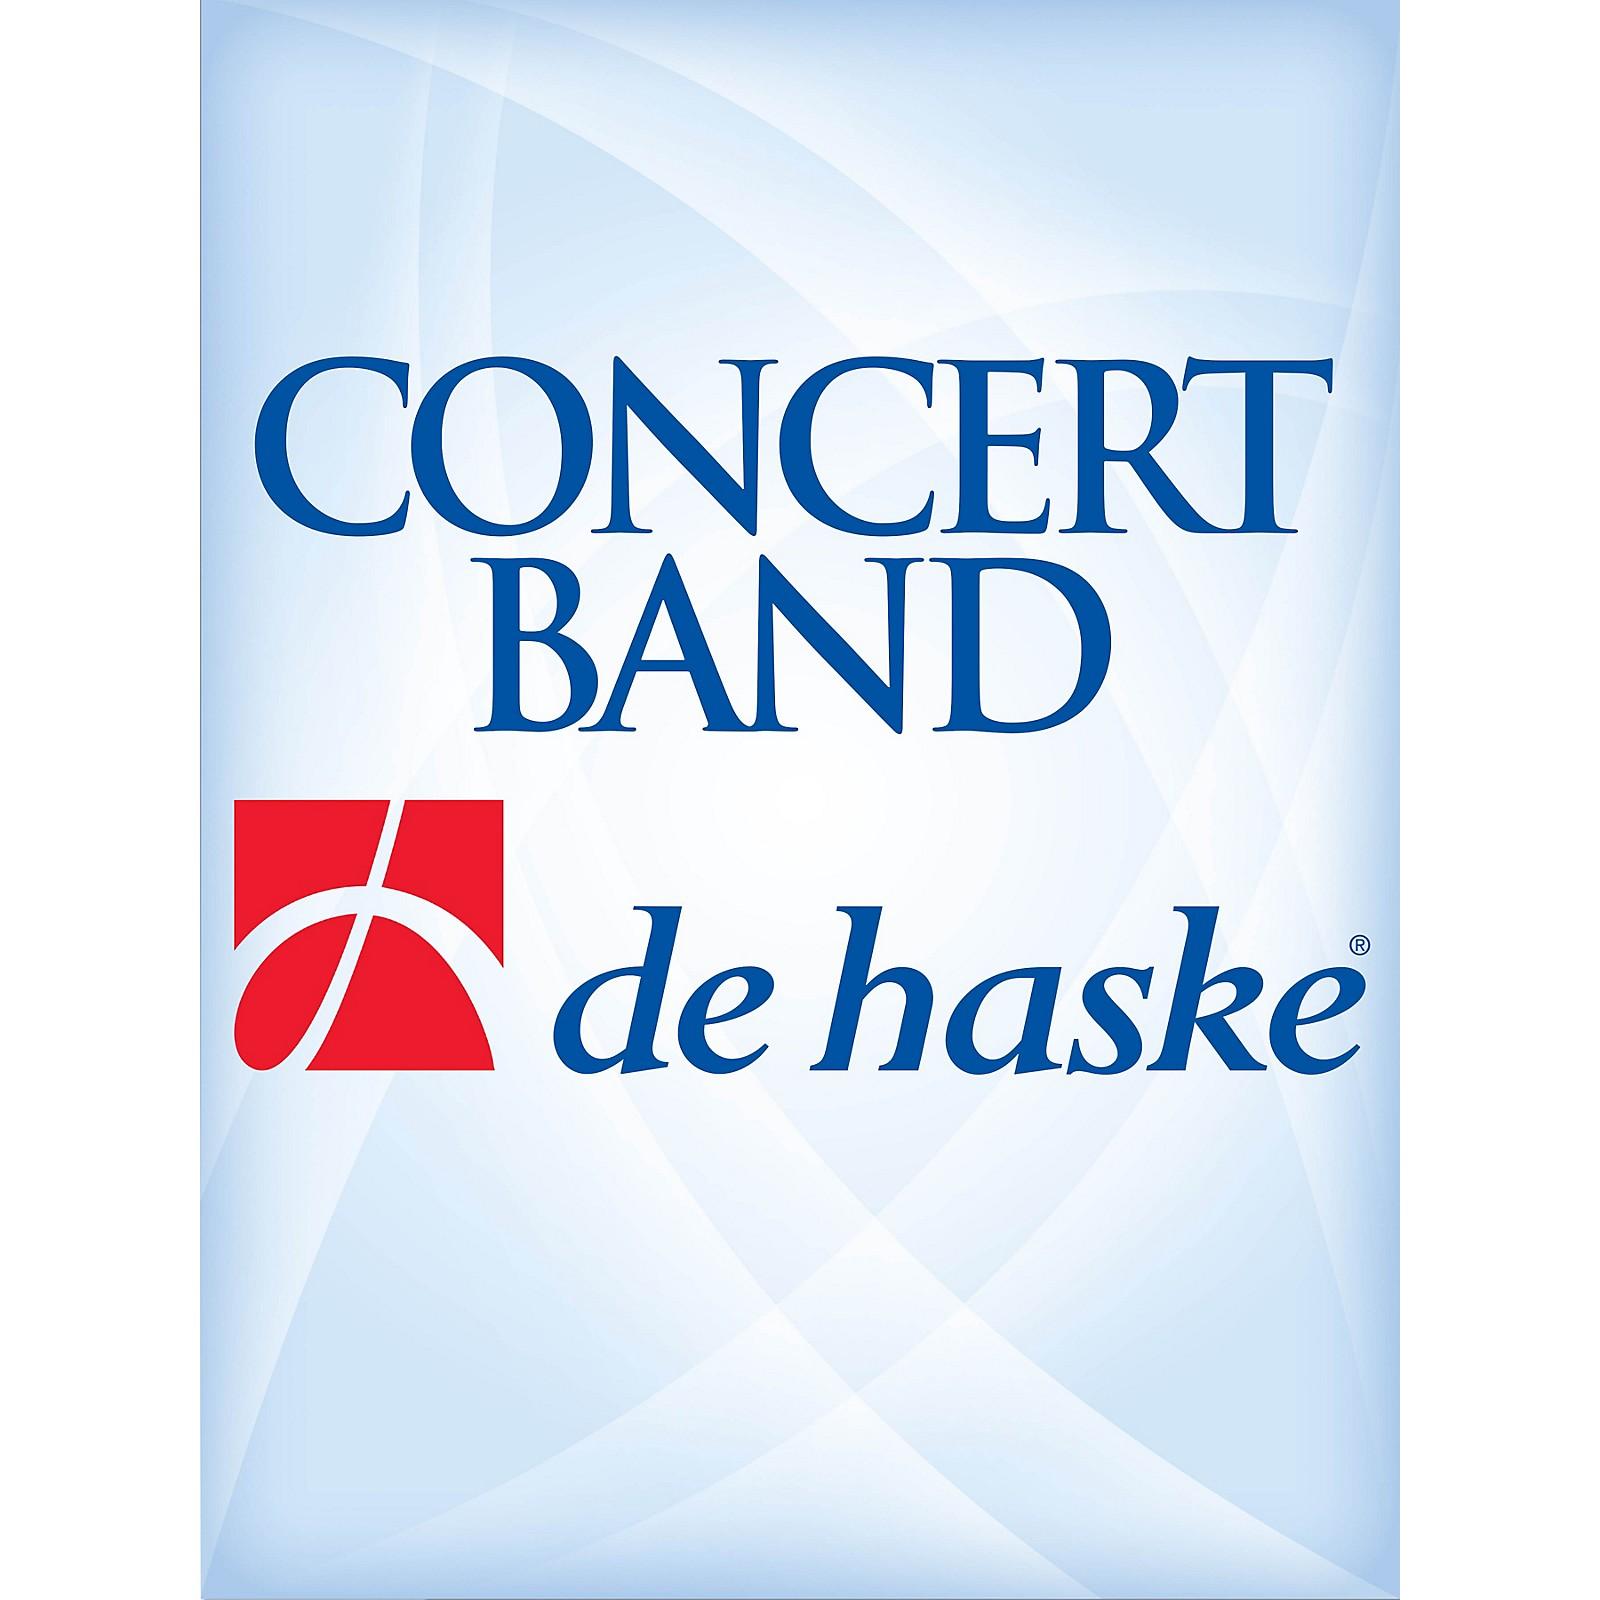 Hal Leonard Tanczi  Concert Band Sc/pts Gr4 Time-13:30 Full Score Concert Band